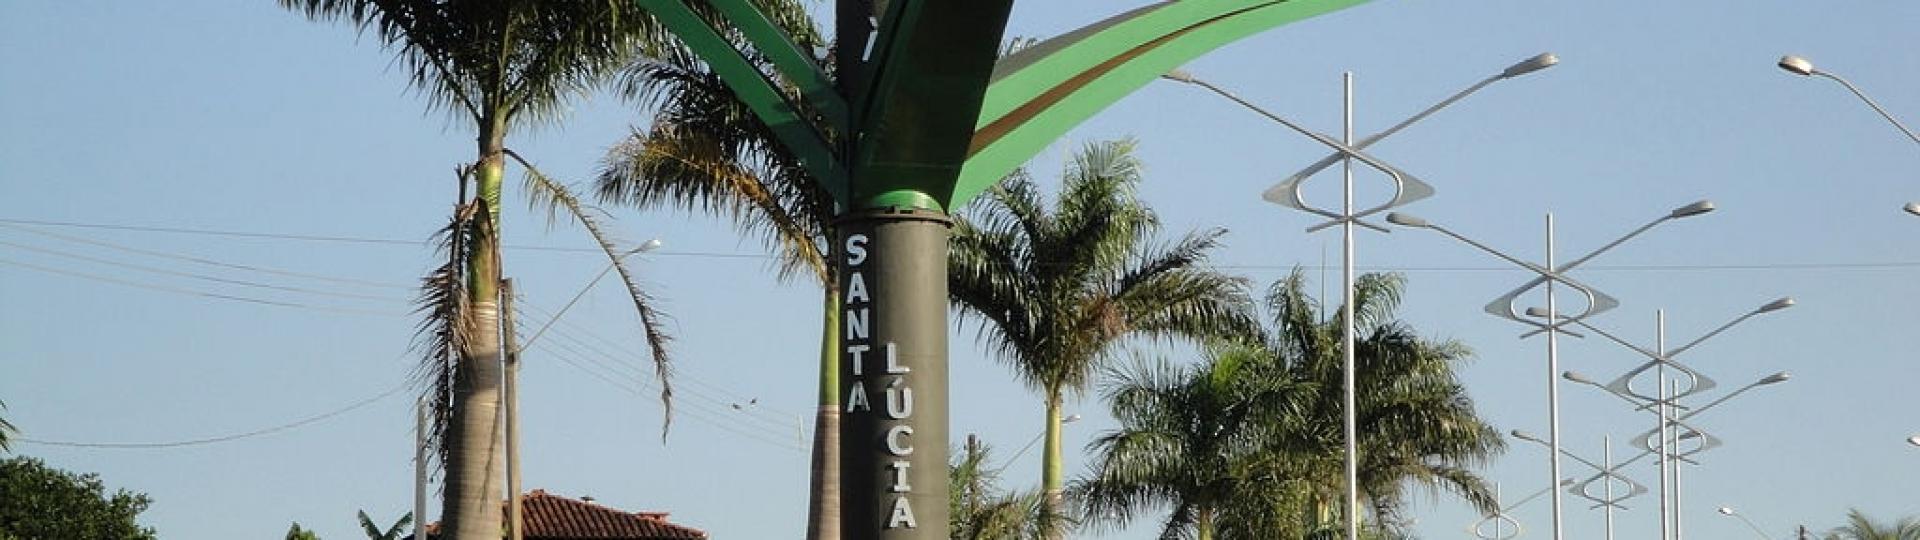 Santa Lúcia: pronta para o desenvolvimento